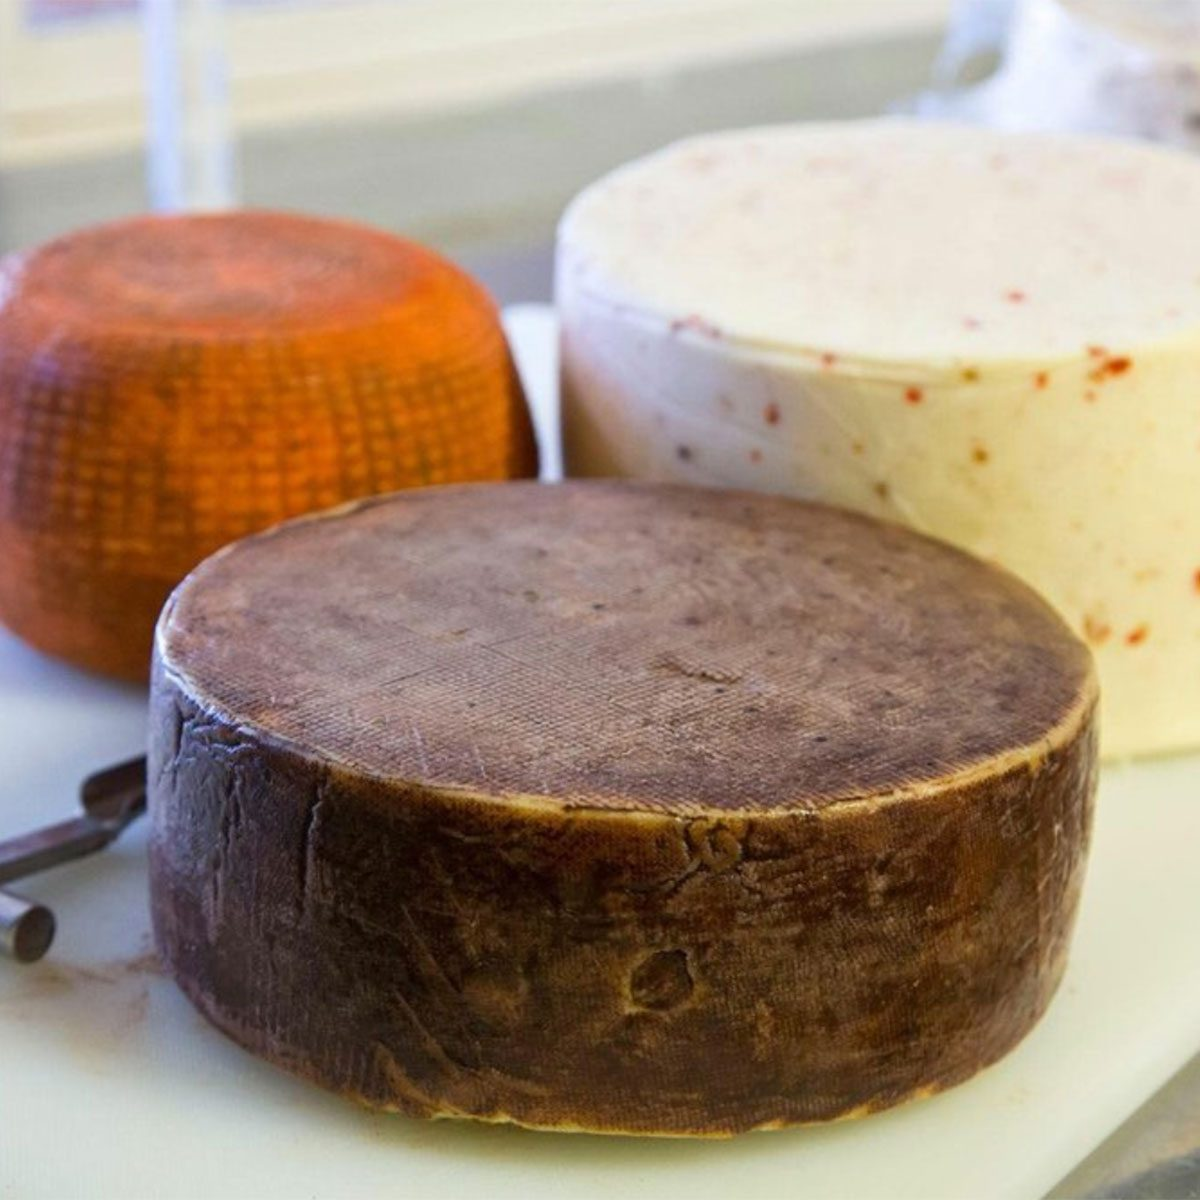 Naked Cow Dairy Farm & Creamery, Waianae